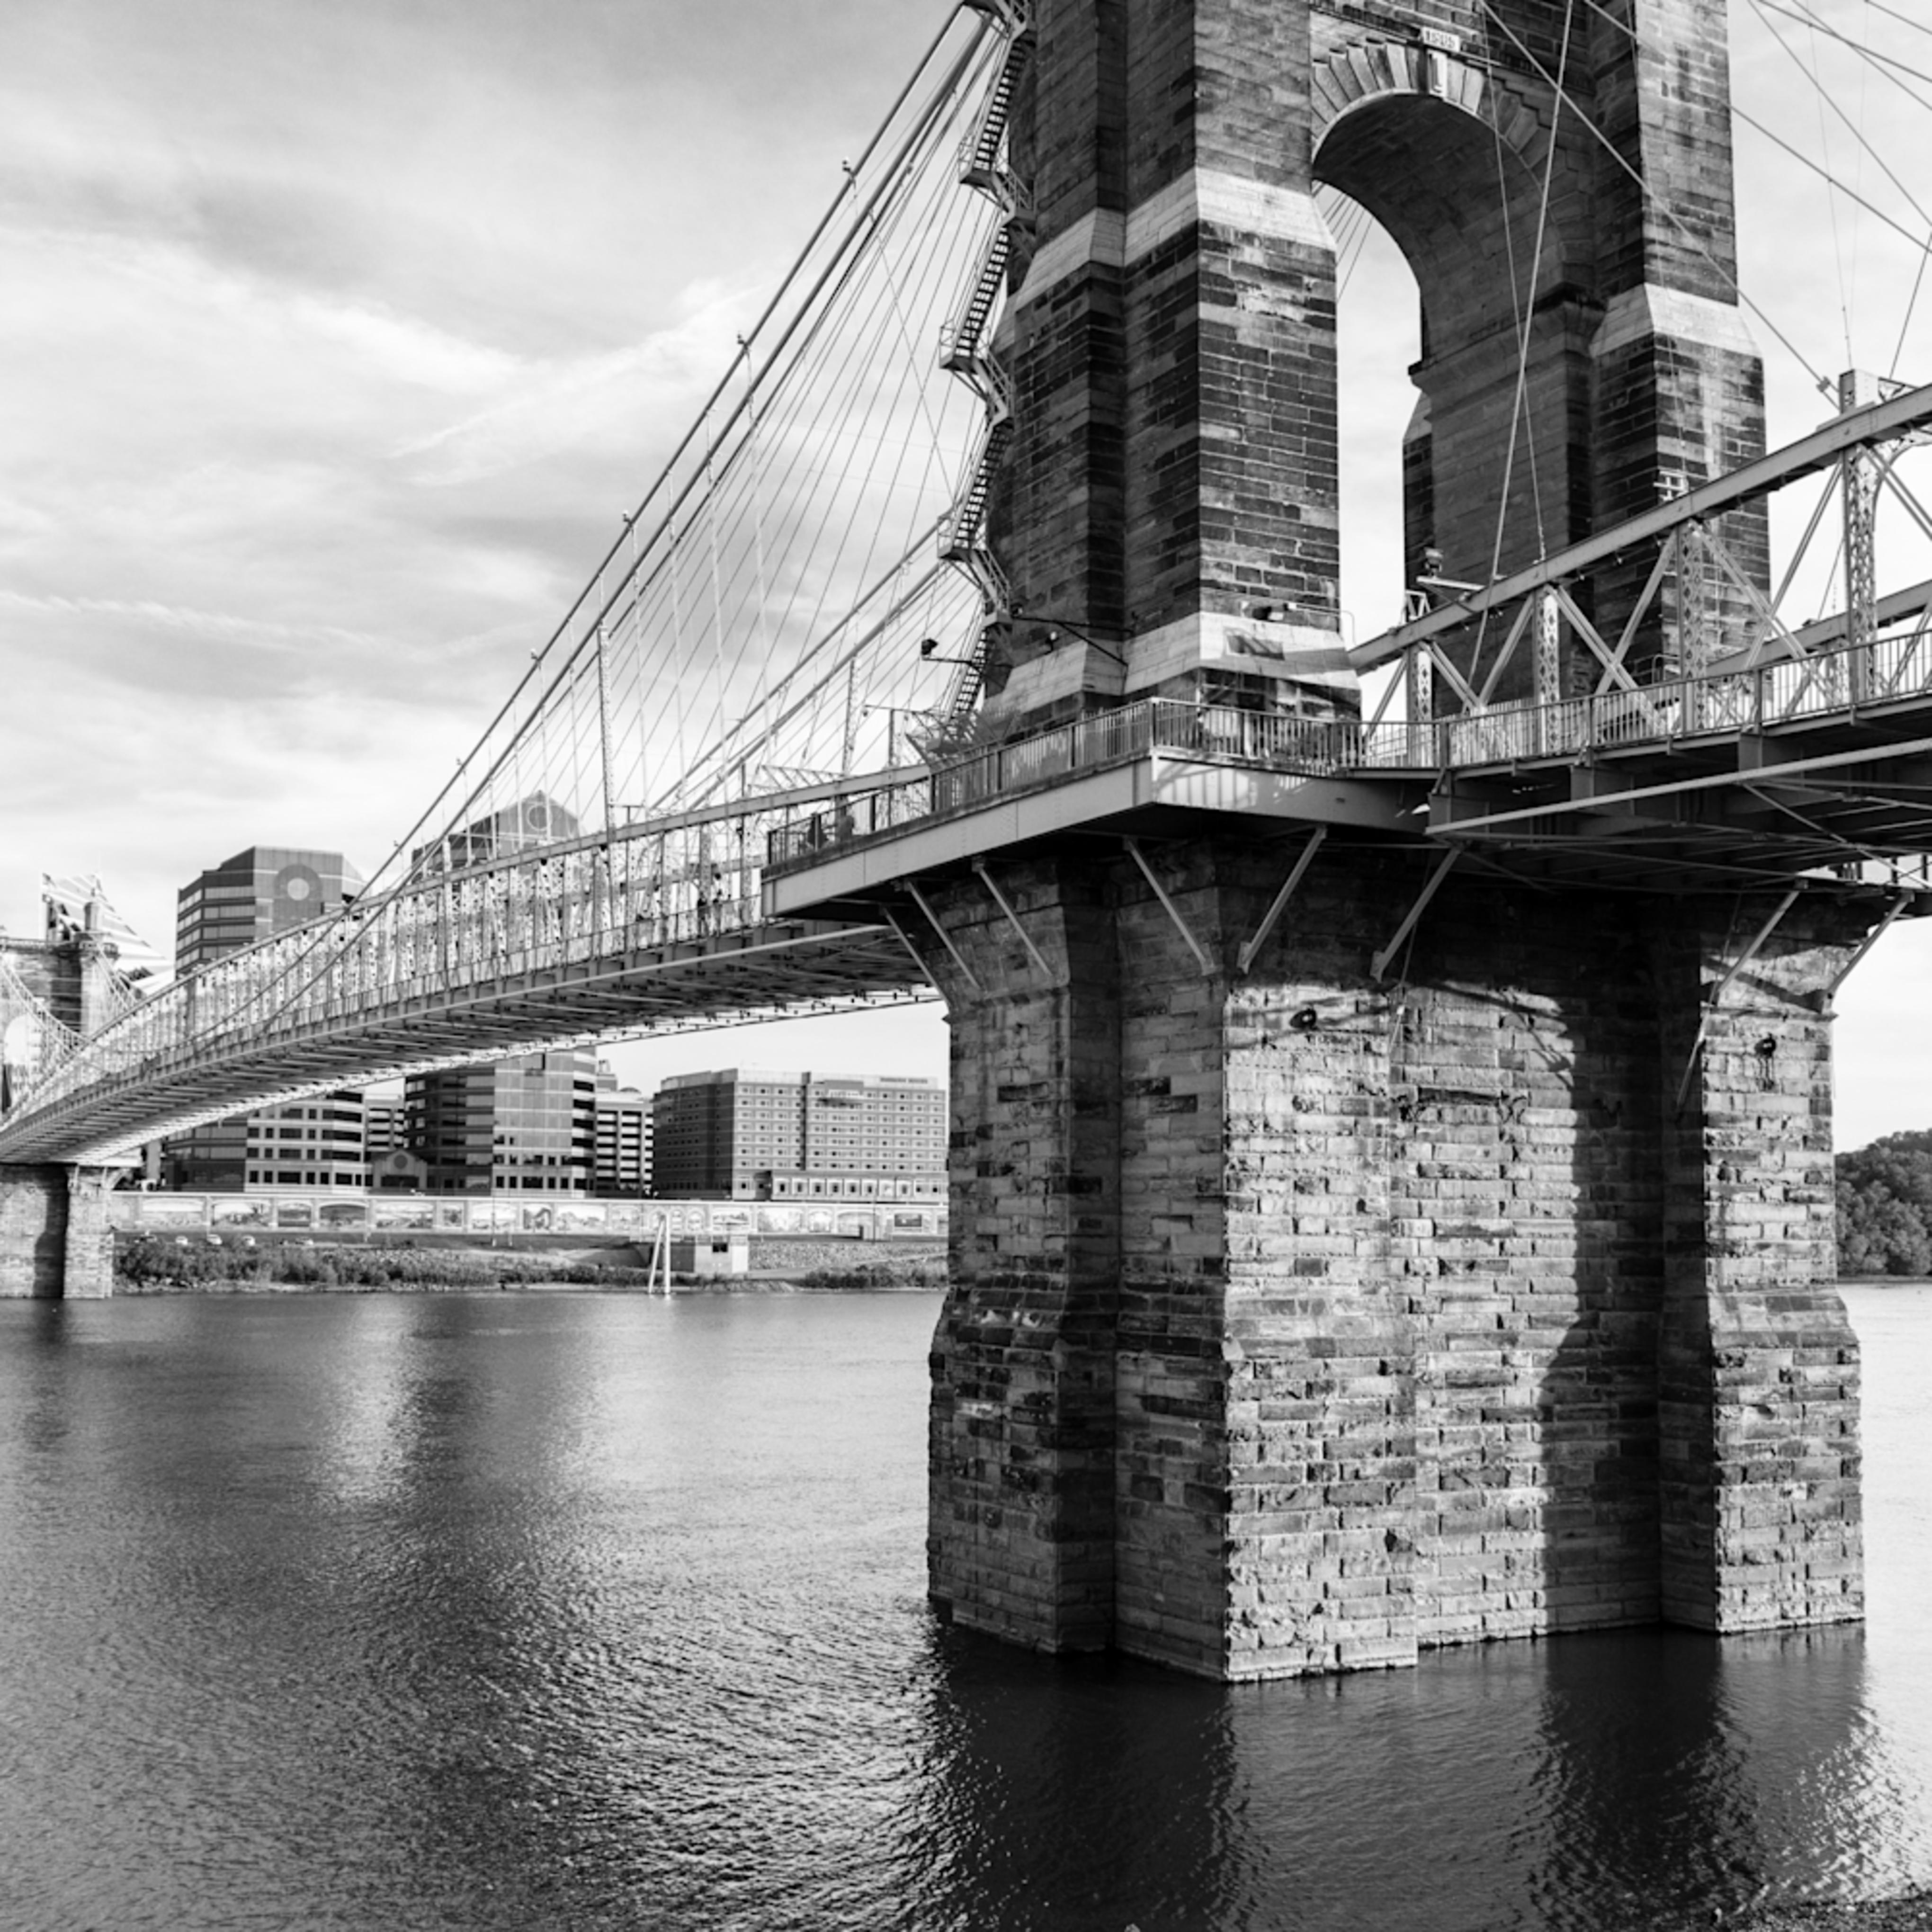 dsc1796cincinnatai roebling bridge bw kzdcjc